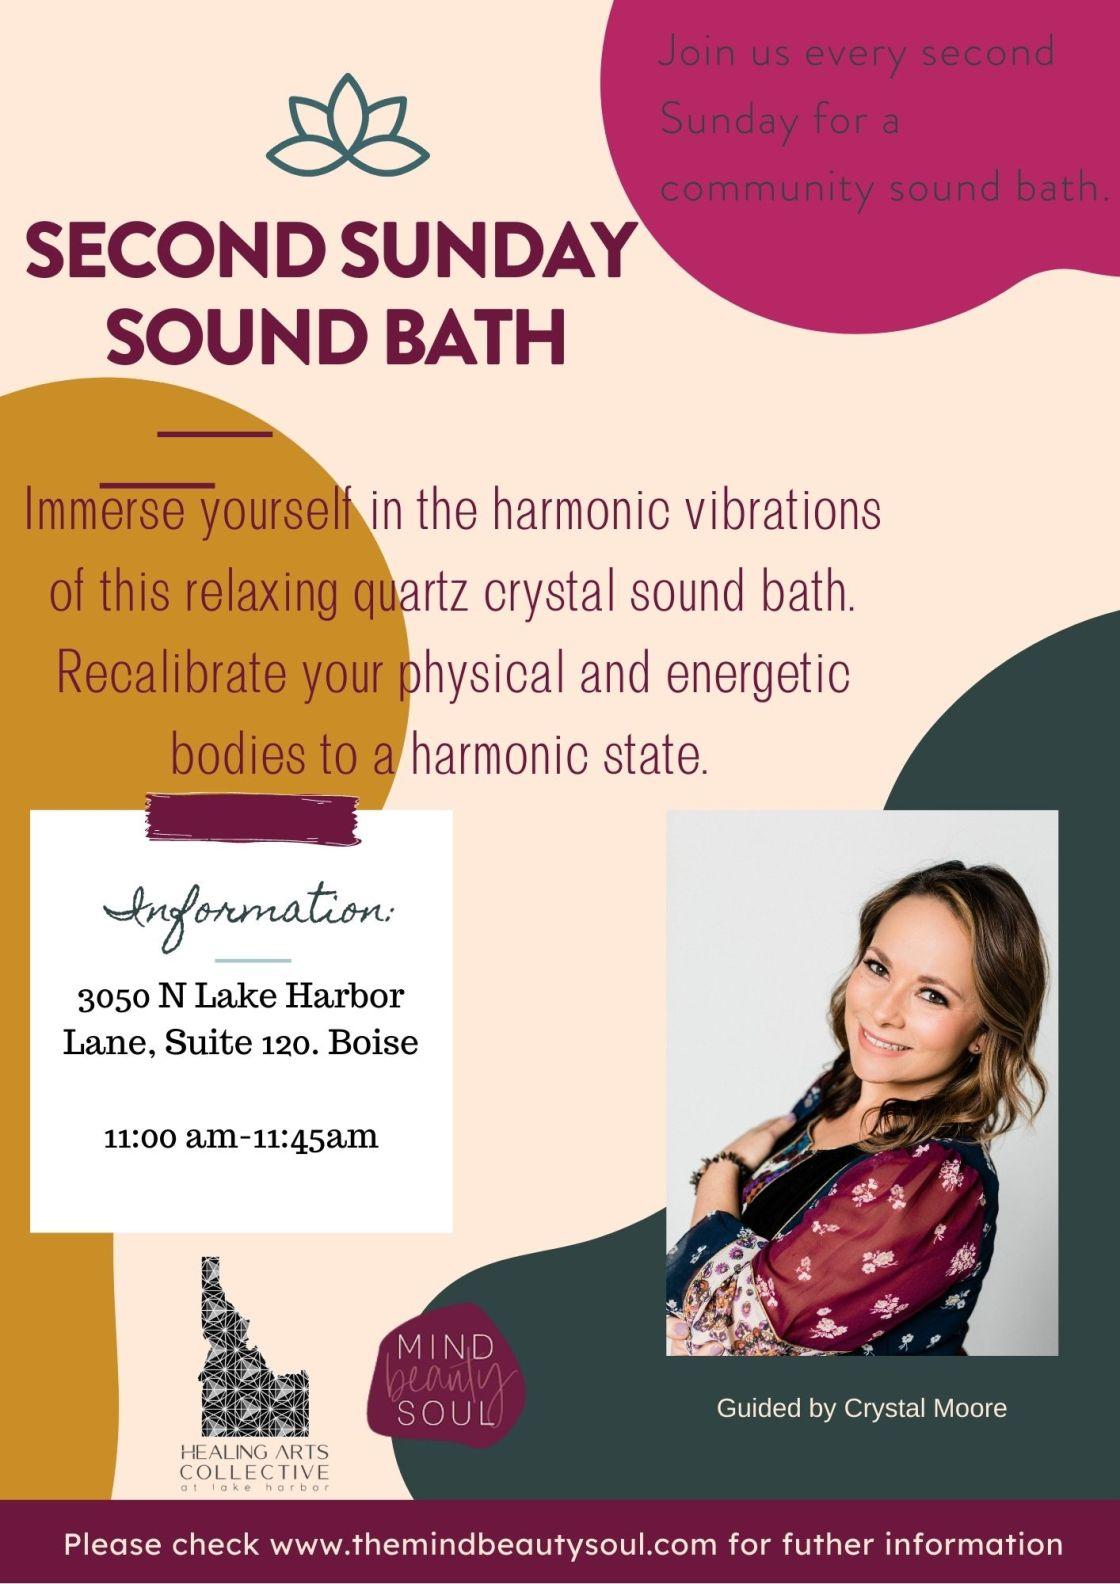 Second Sunday Soundbath jpg